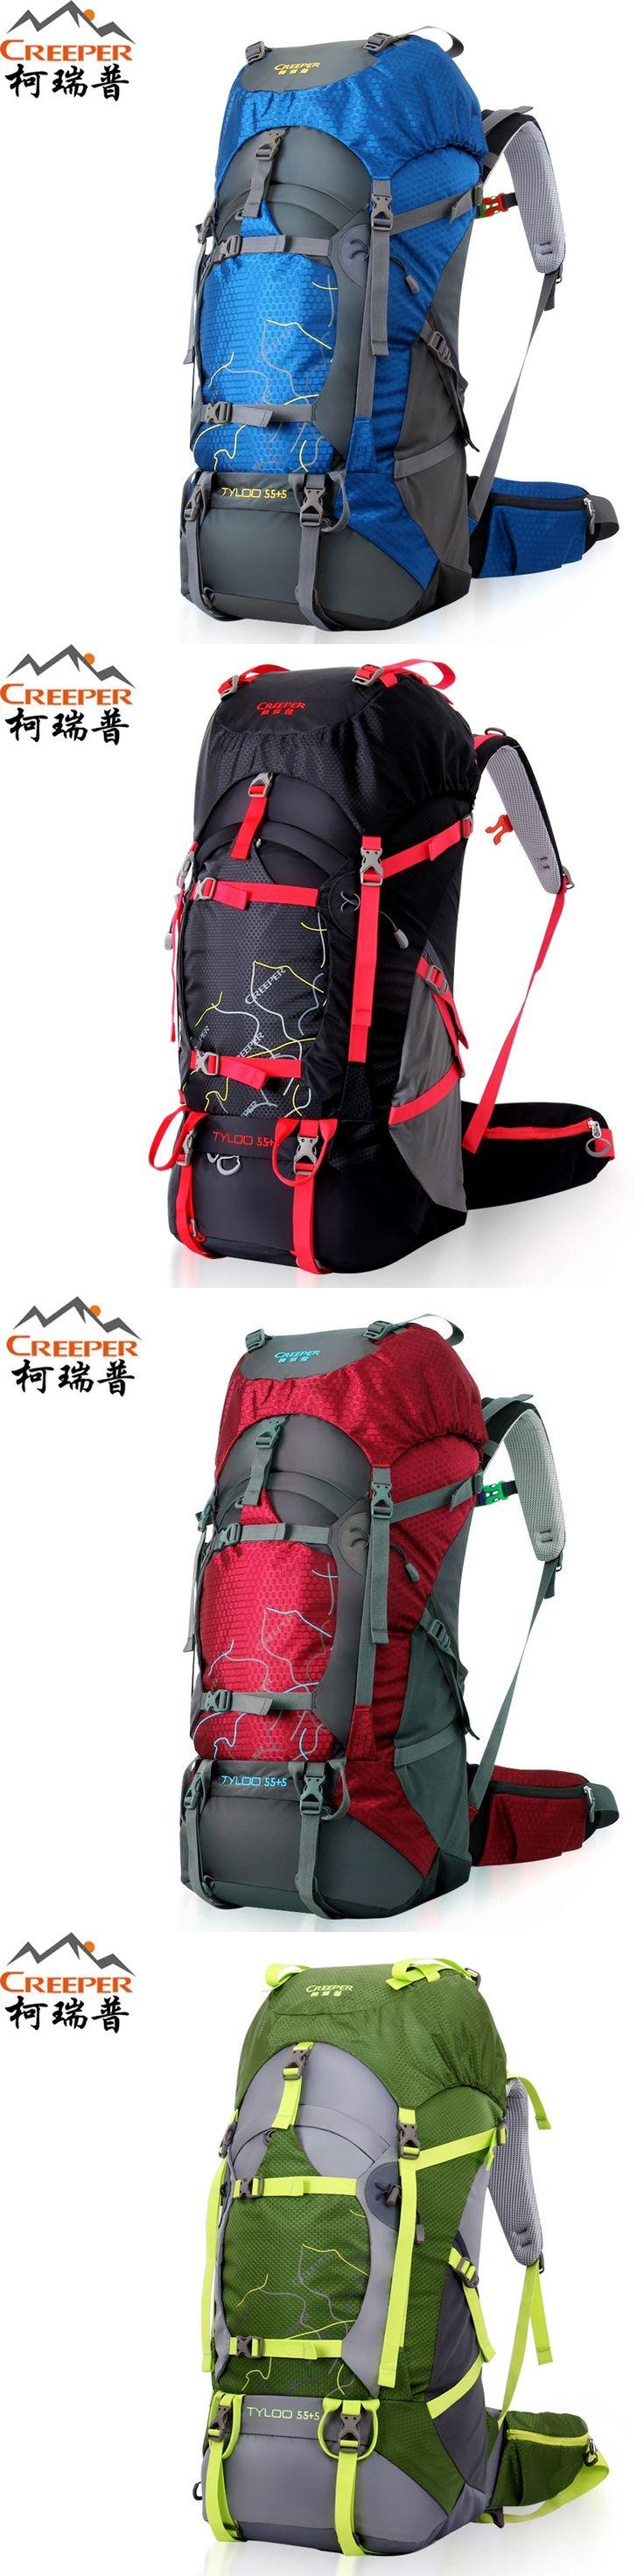 Creeper Camping Bag 50L 60L 70L Hiking Backpacks Unisex Outdoor Sport Bag Waterproof Rain Cover Molle Backpack Mochila Masculina